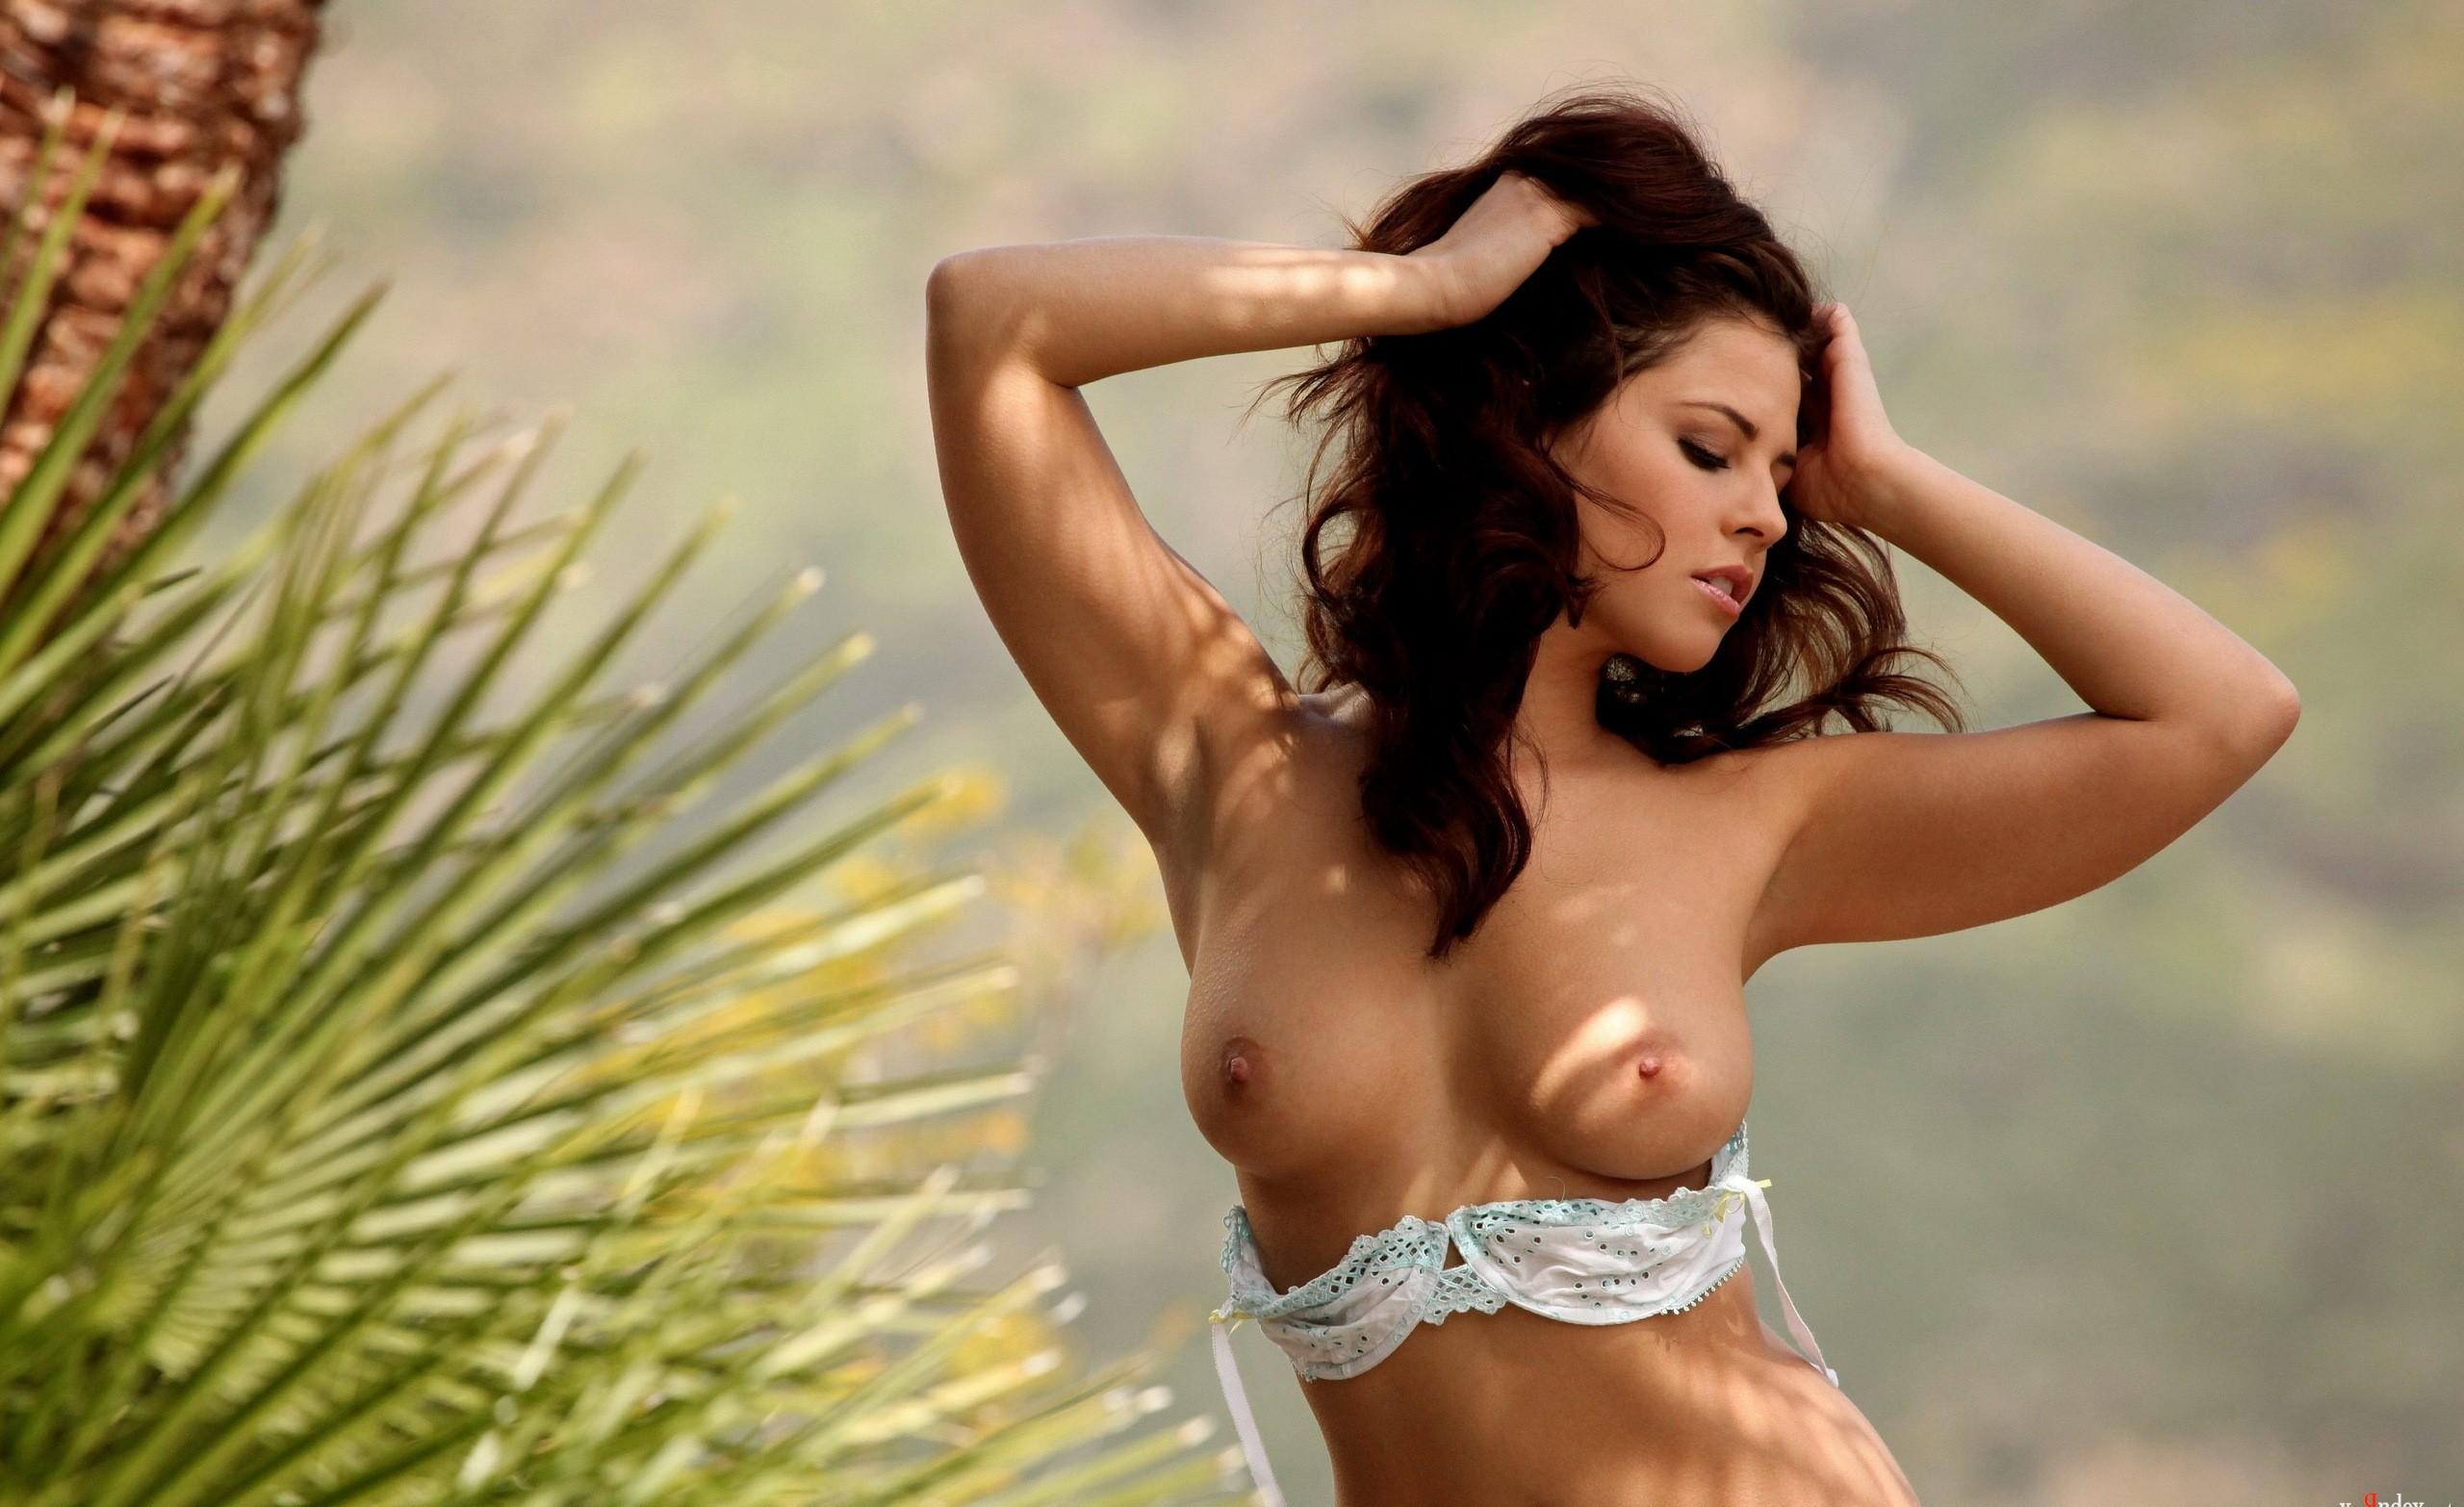 Erotic mature women free HD porn photo